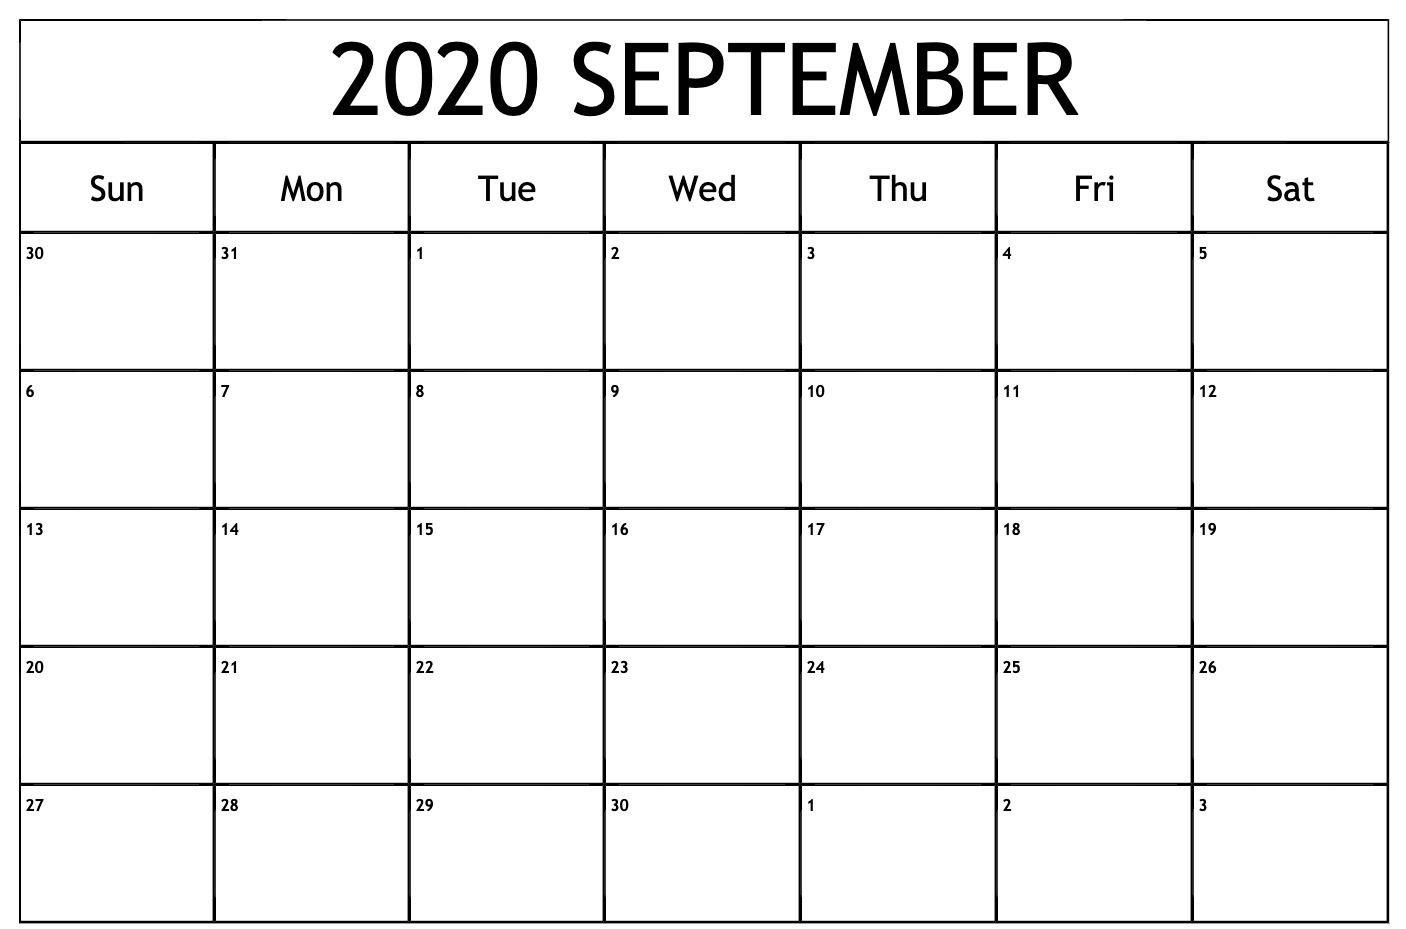 September 2020 Calendar Pdf   September Calendar, Calendar Free Blank Printable Monthly Calendar Pdf